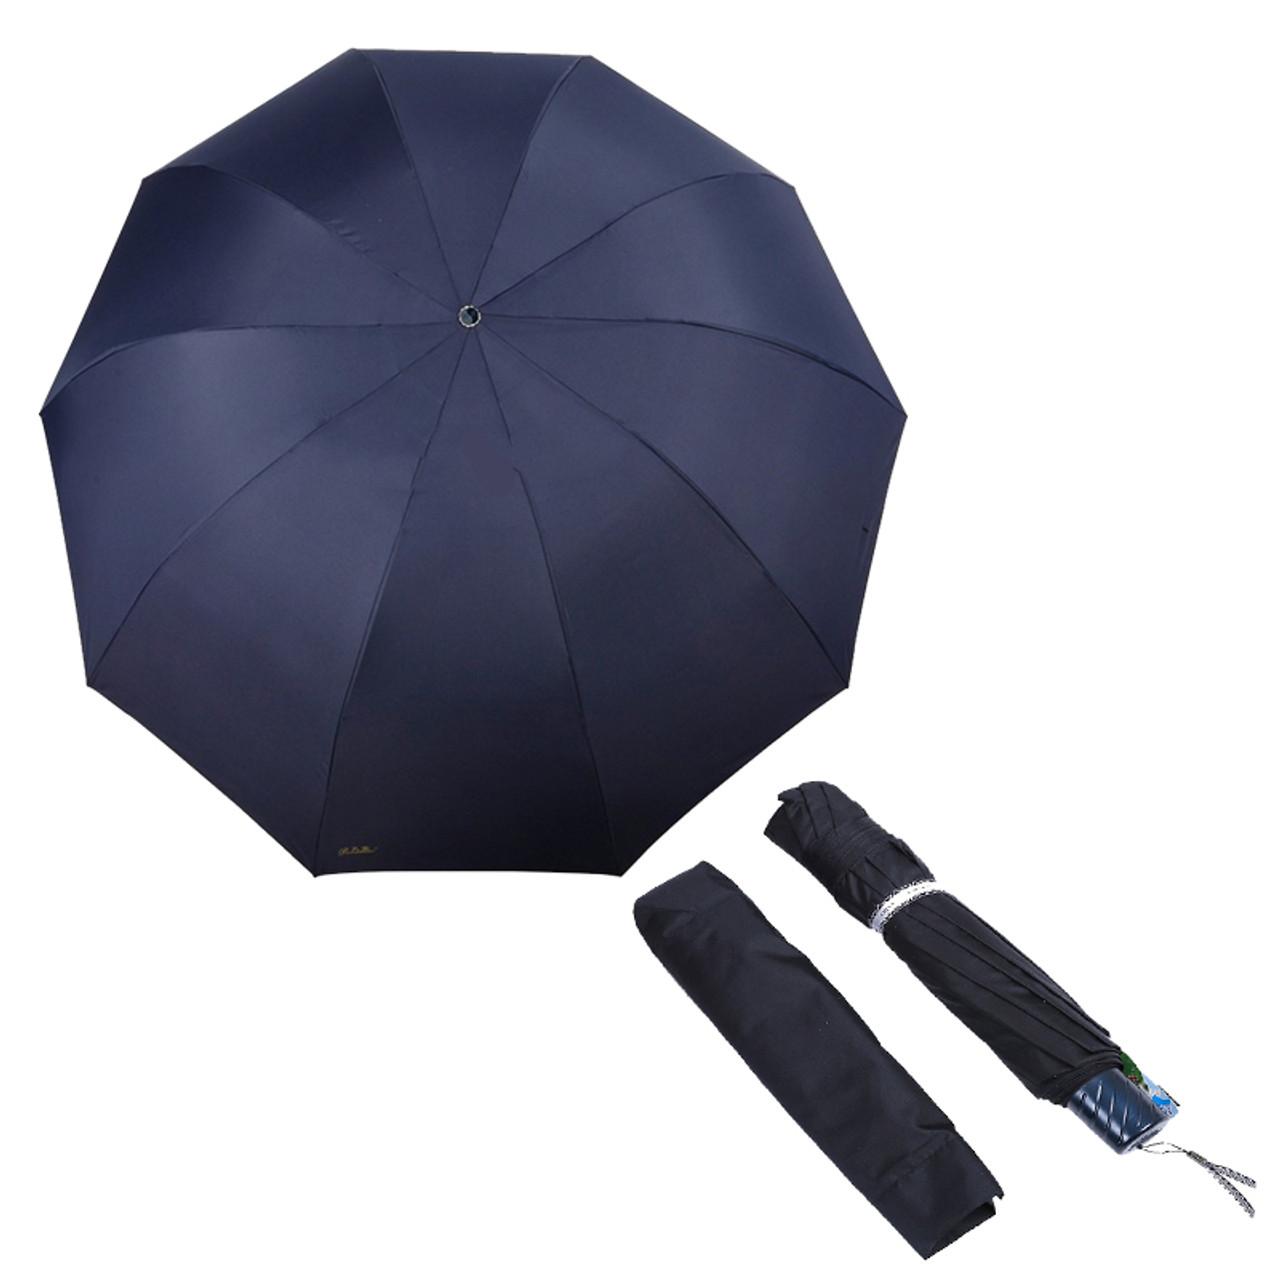 ZWYY Rain Umbrella,130cm Big Umbrella Men Women Windproof Rainproof Travel Umbrella Oversize Double Layer Sun 3 Floding Sun Umbrellas,red